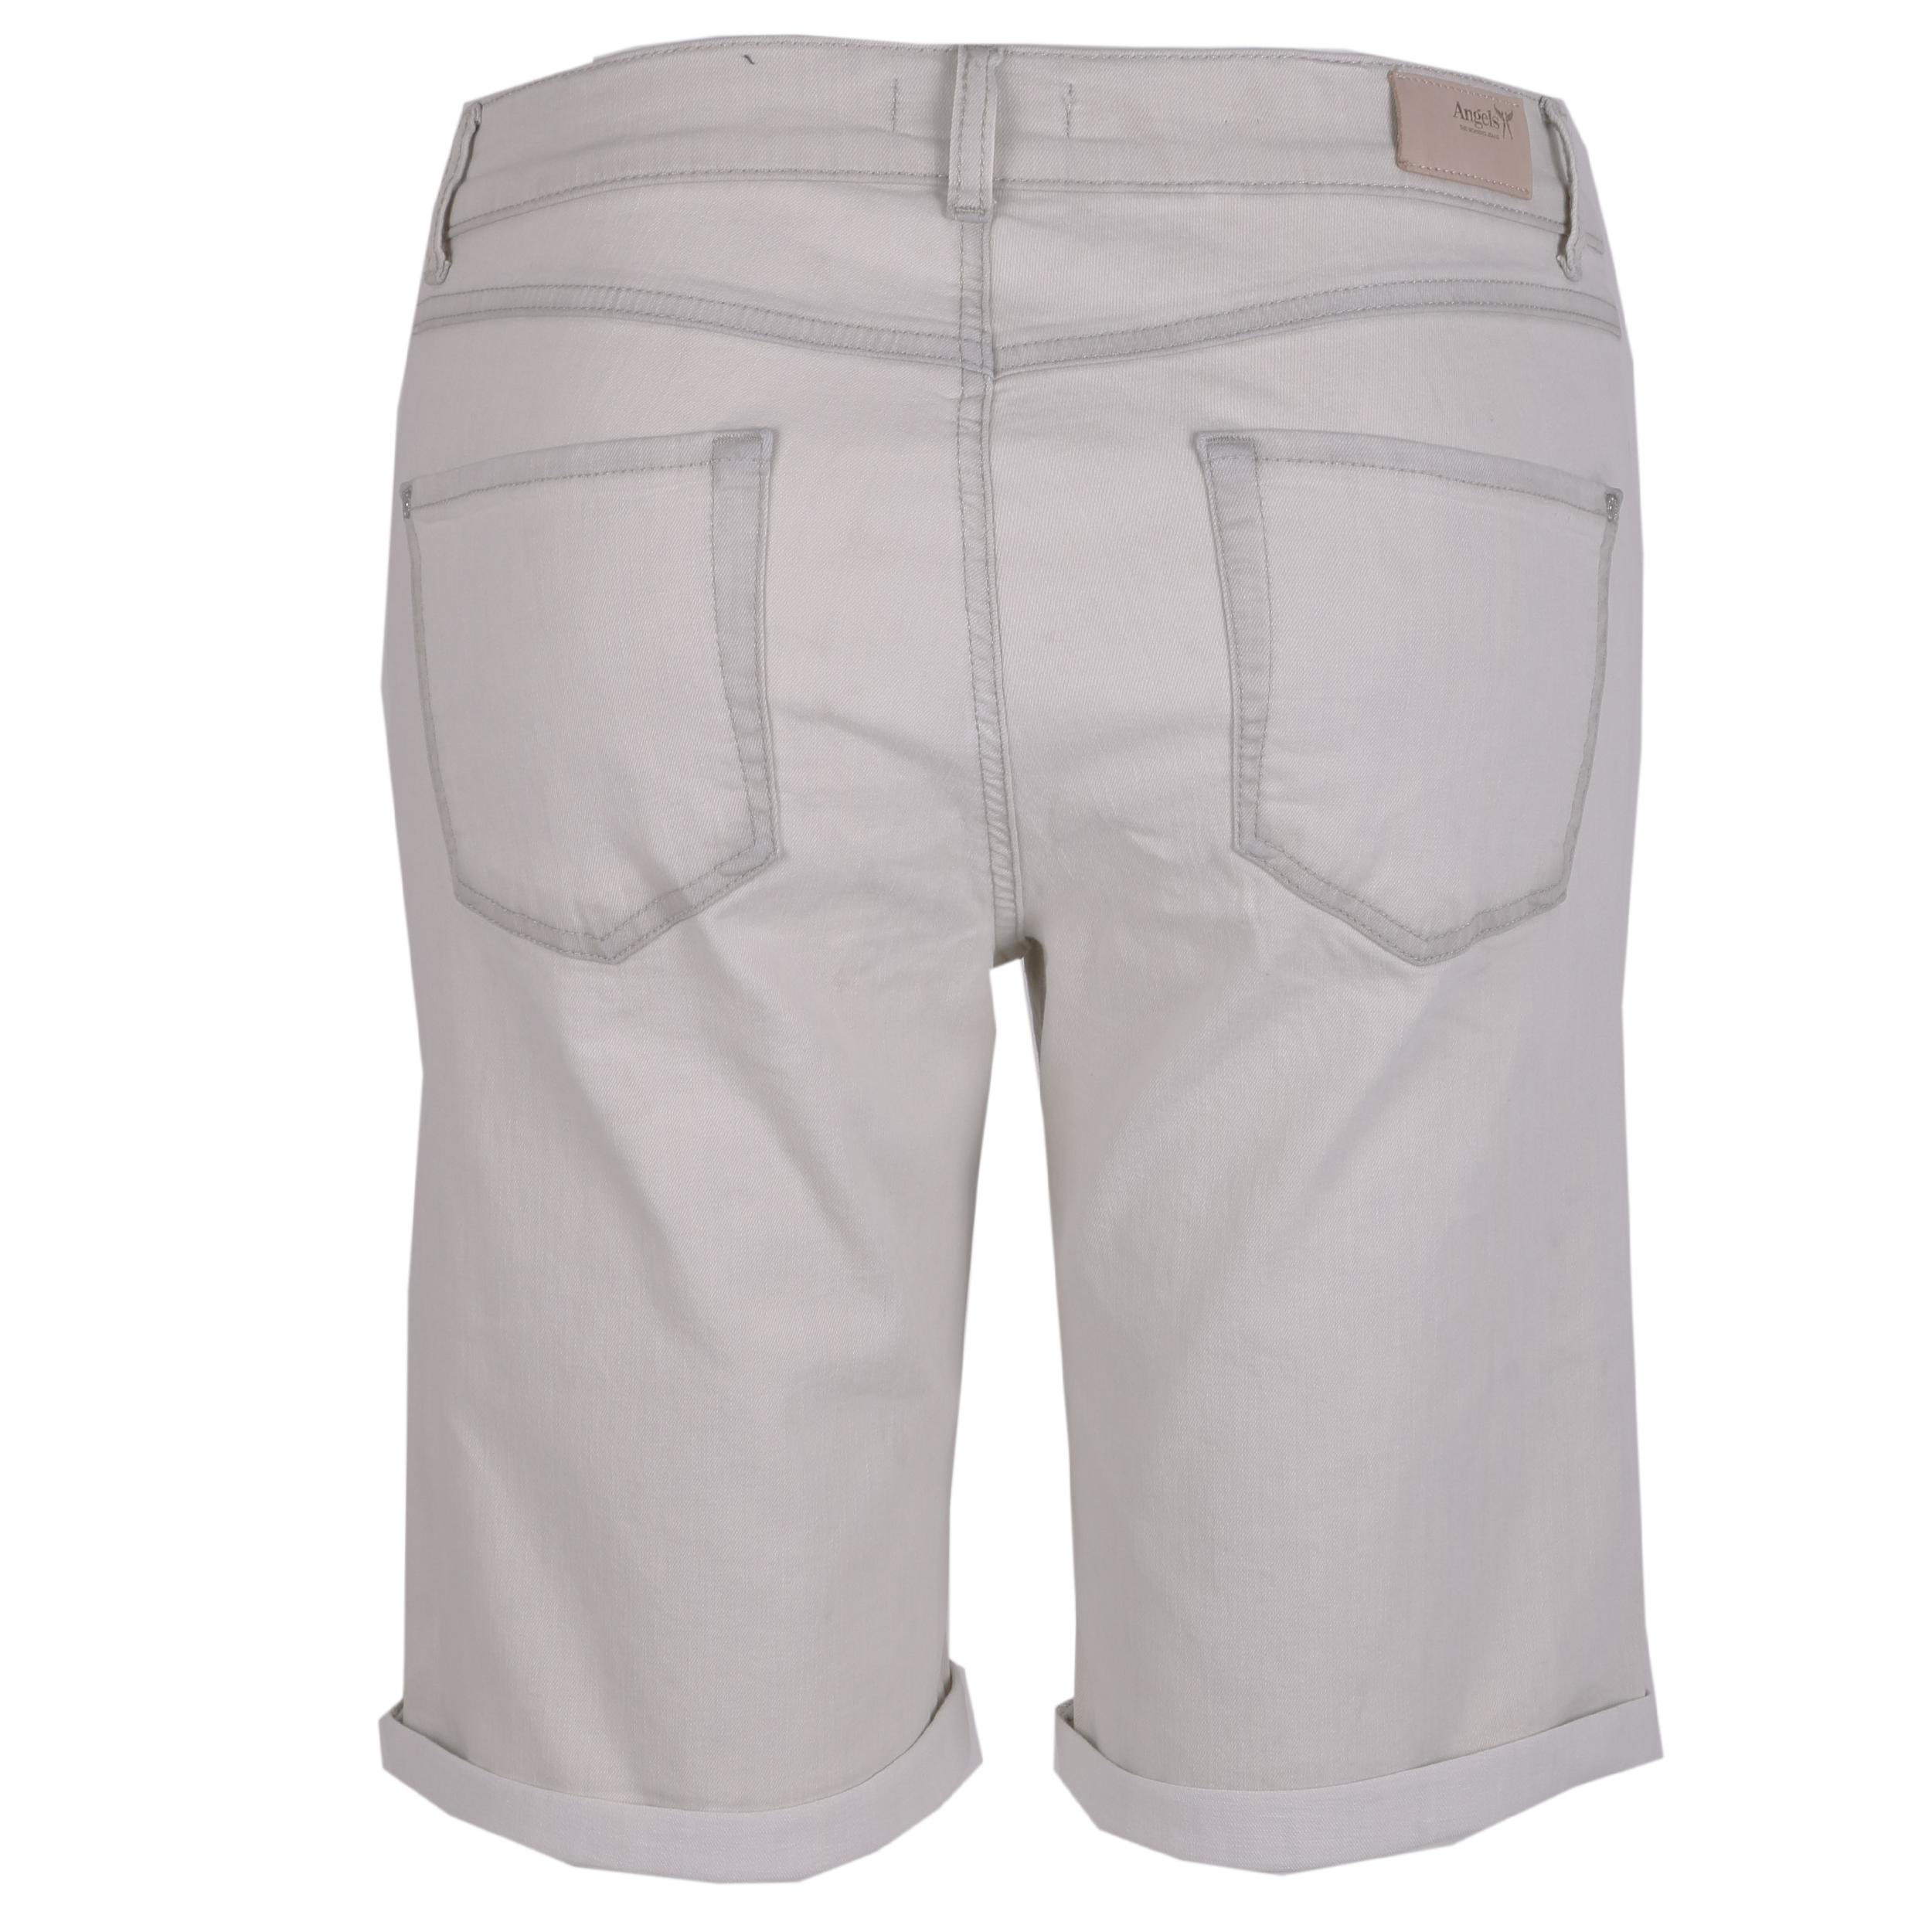 Angels Damen Bermuda Shorts TU - kitt used 44